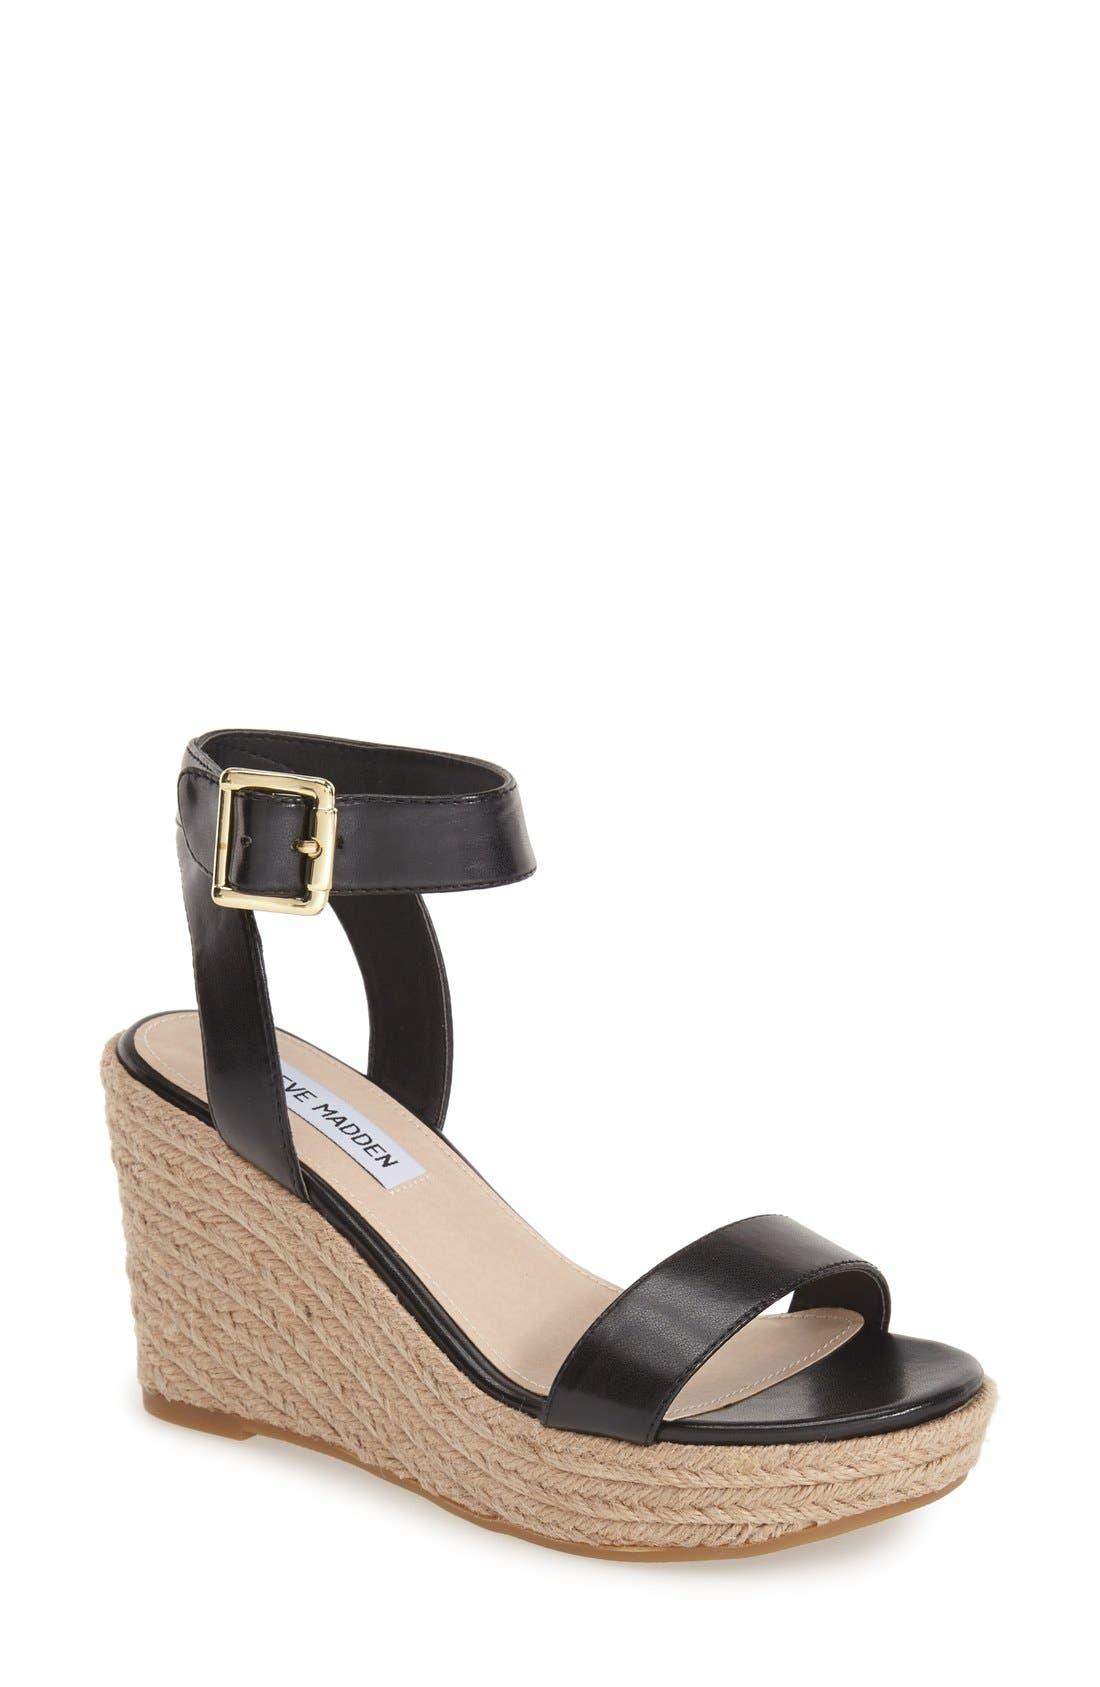 'Seaside' Wedge Sandal, Main, color, 002